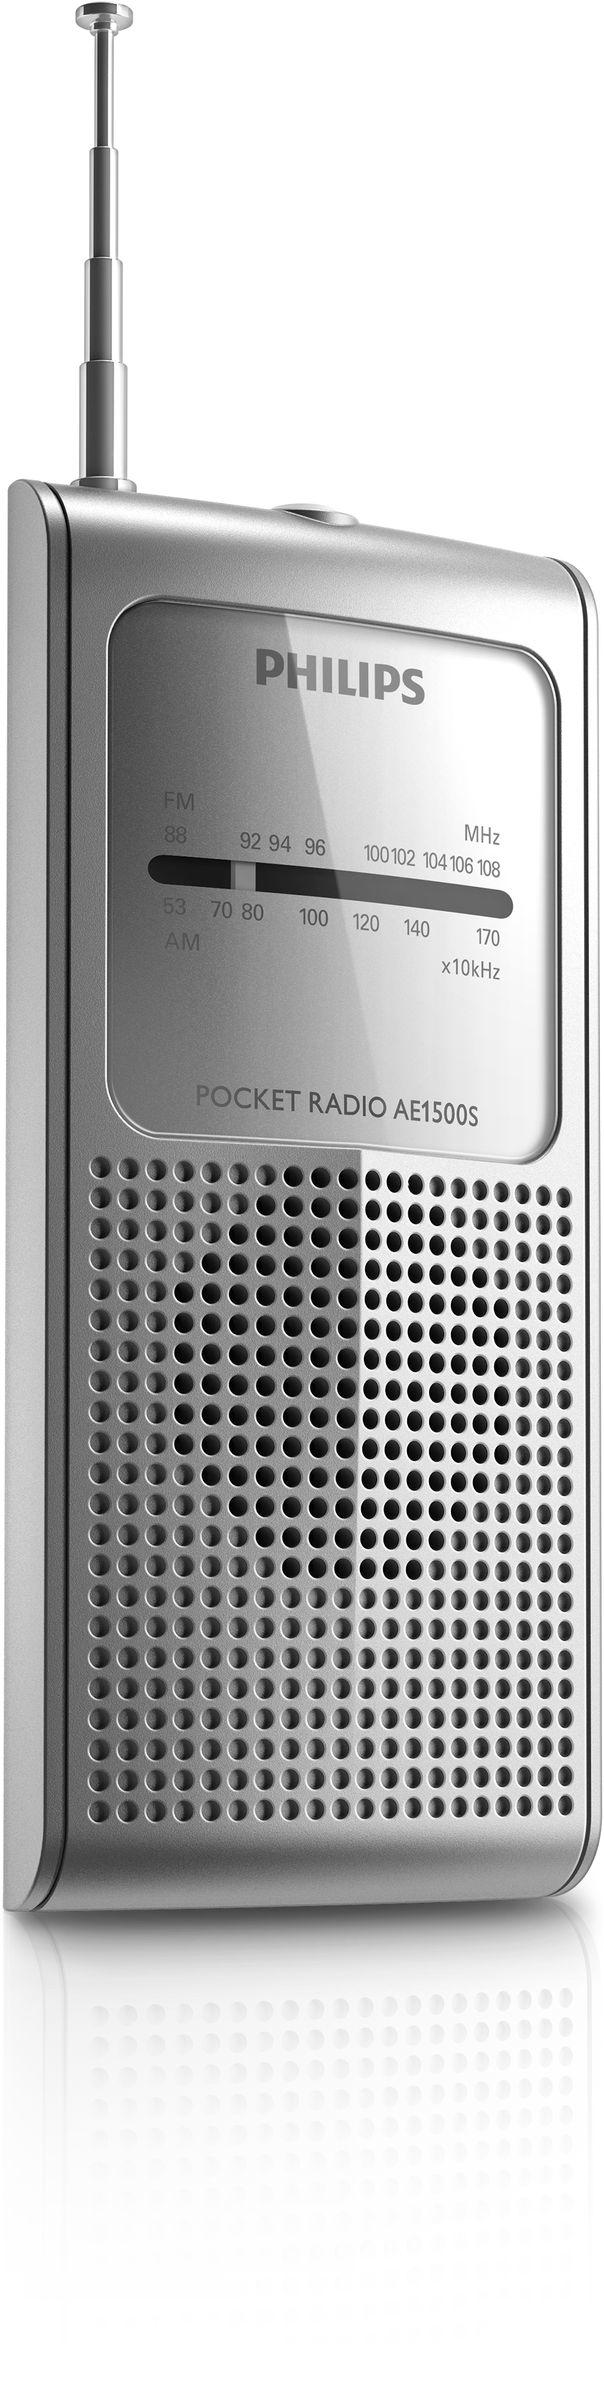 Philips AE1500S/37 Portatile Analogico Argento radio